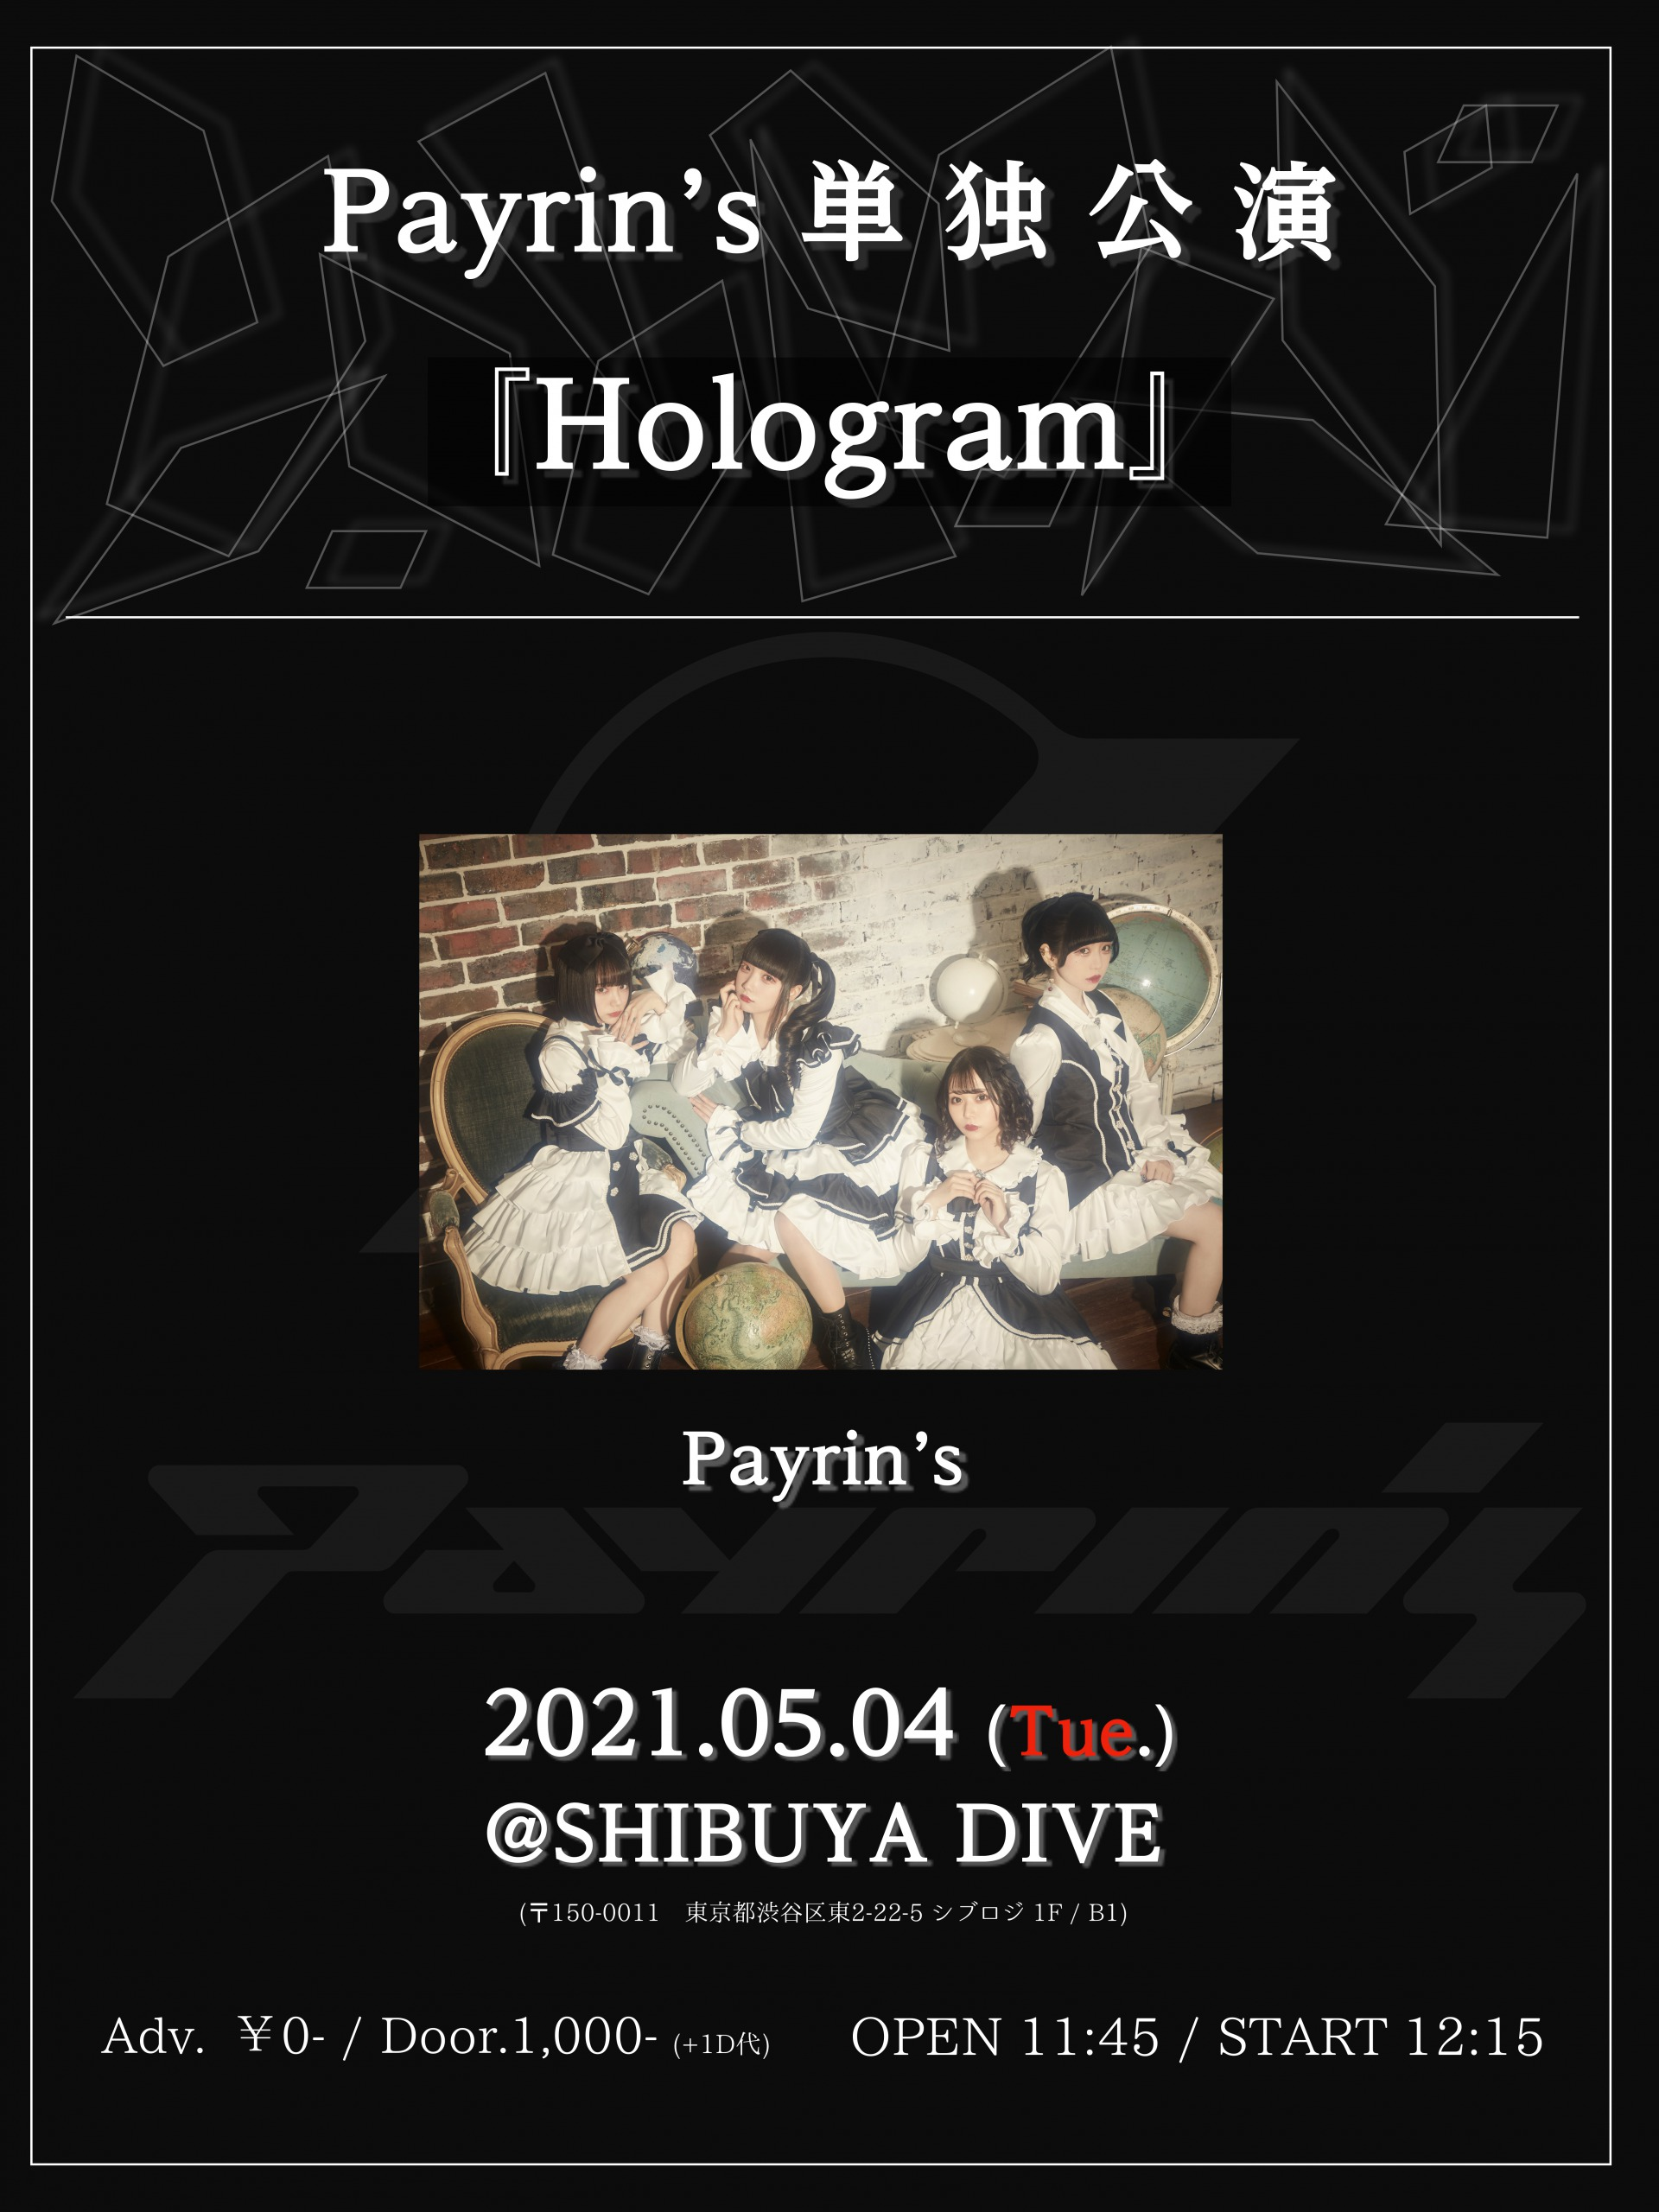 Payrin's 単独公演 『Hologram』